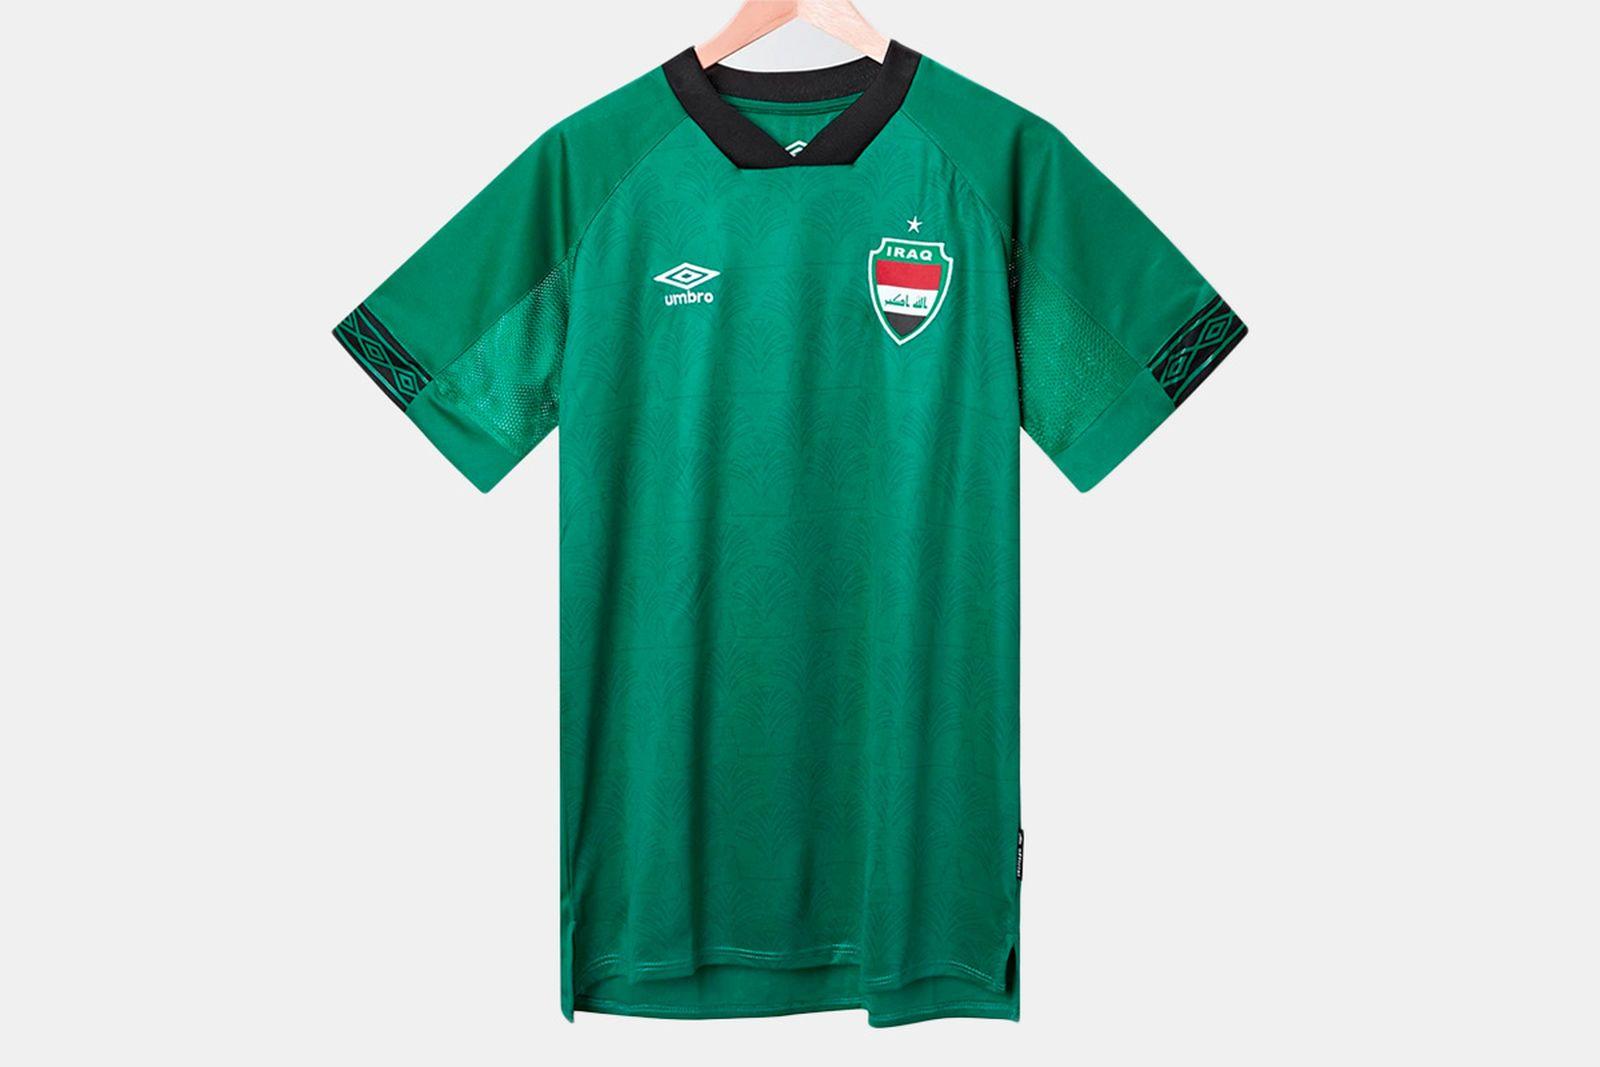 umbro-iraq-2021-home-away-jersey-05